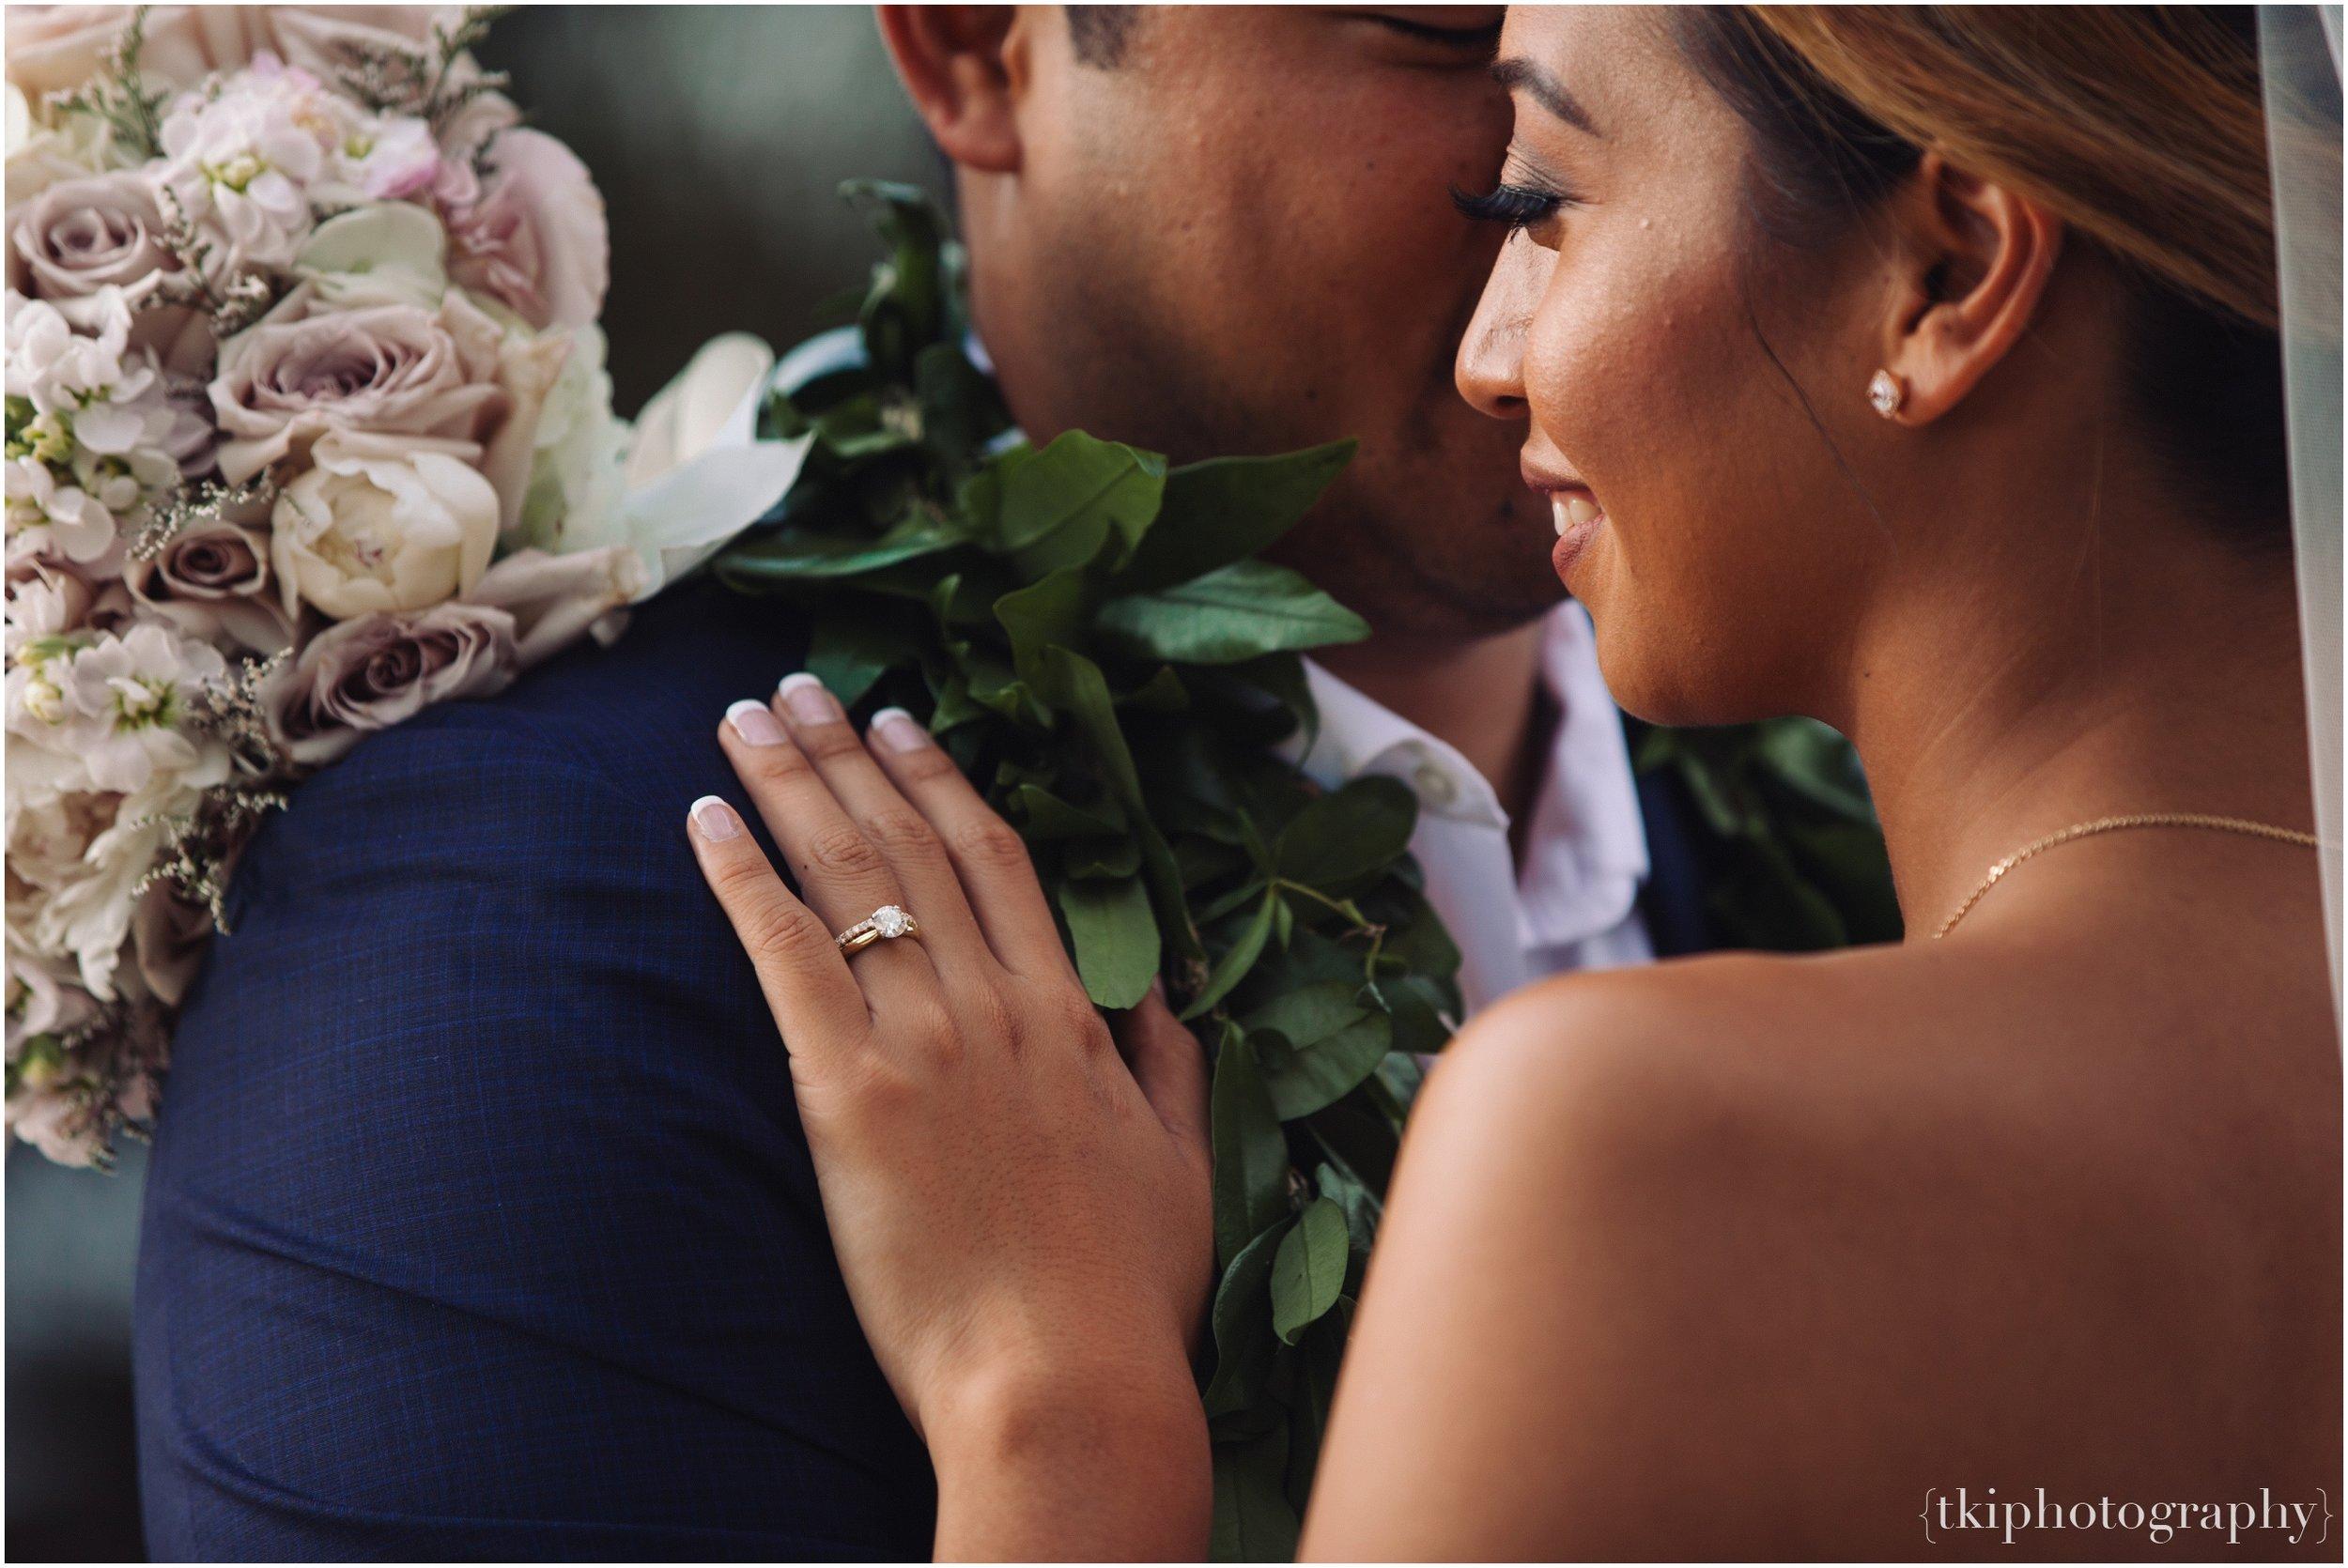 Oahu-Destination-Wedding-Beach_0108.jpg